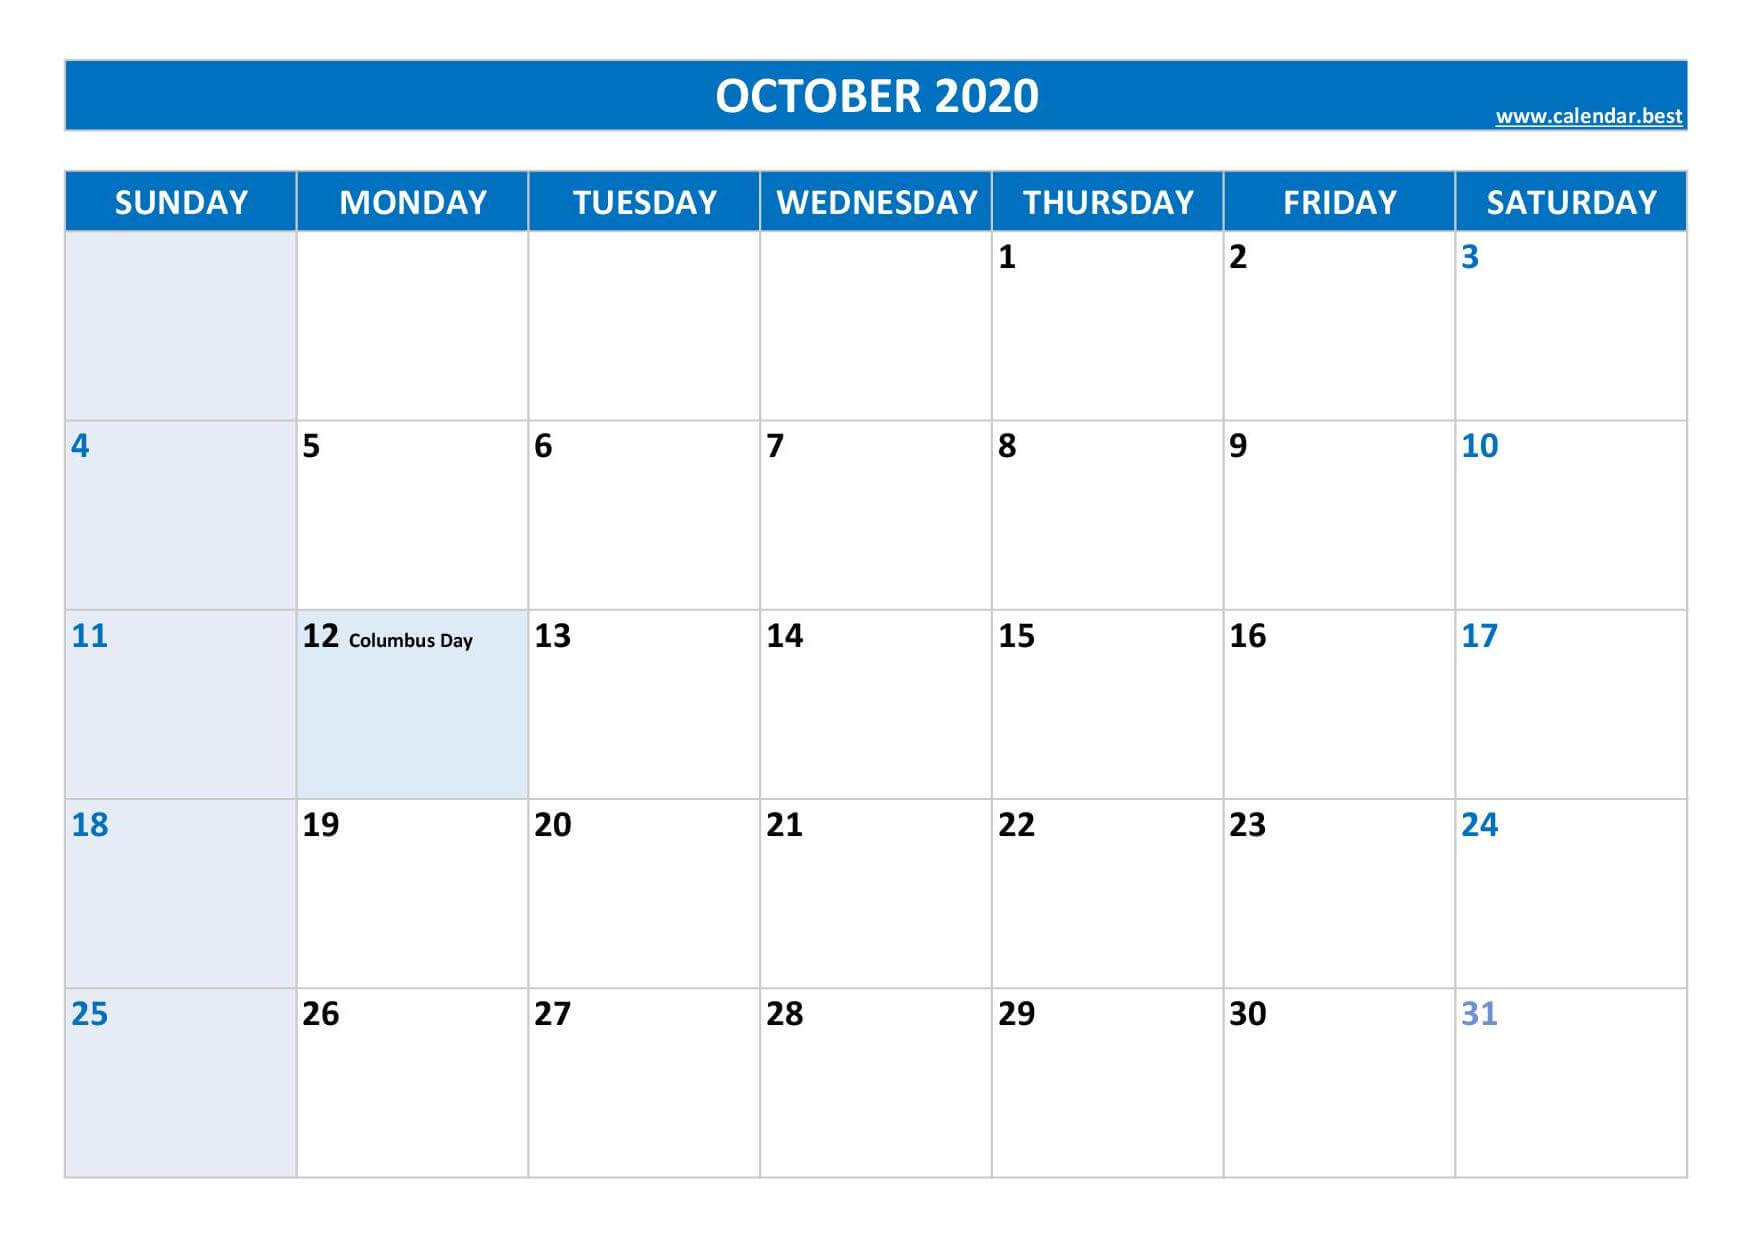 2020 October Calendar with Holidays